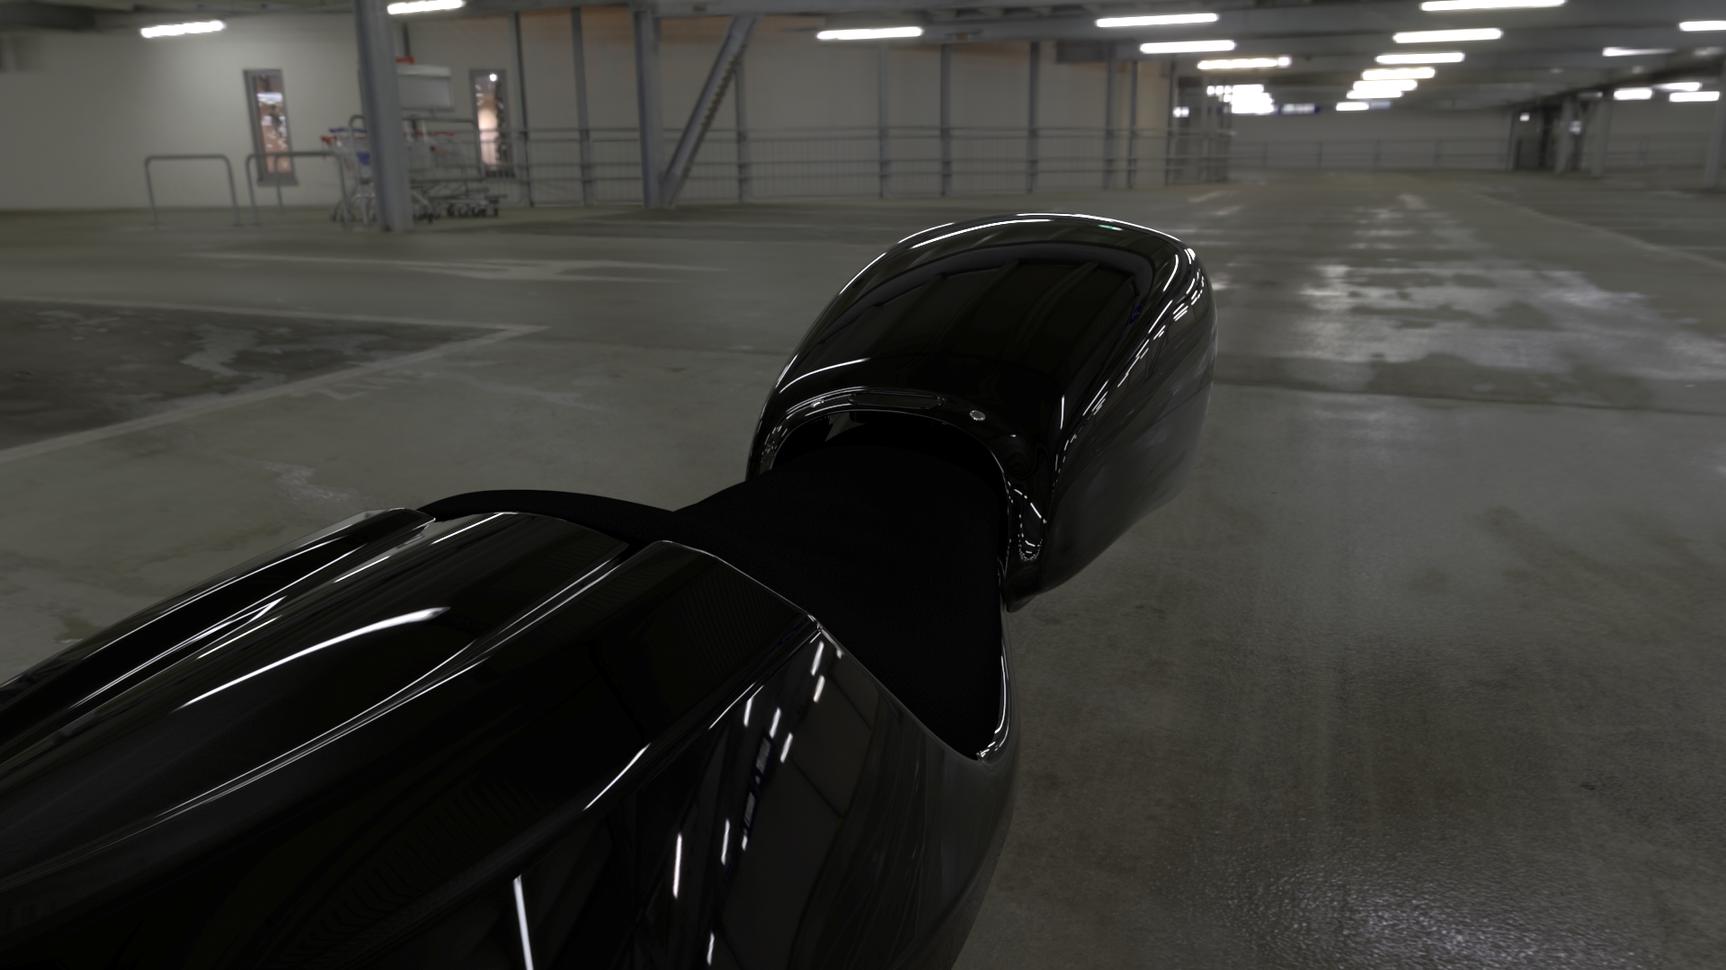 Vred All Parts All Black Garage Closeup2